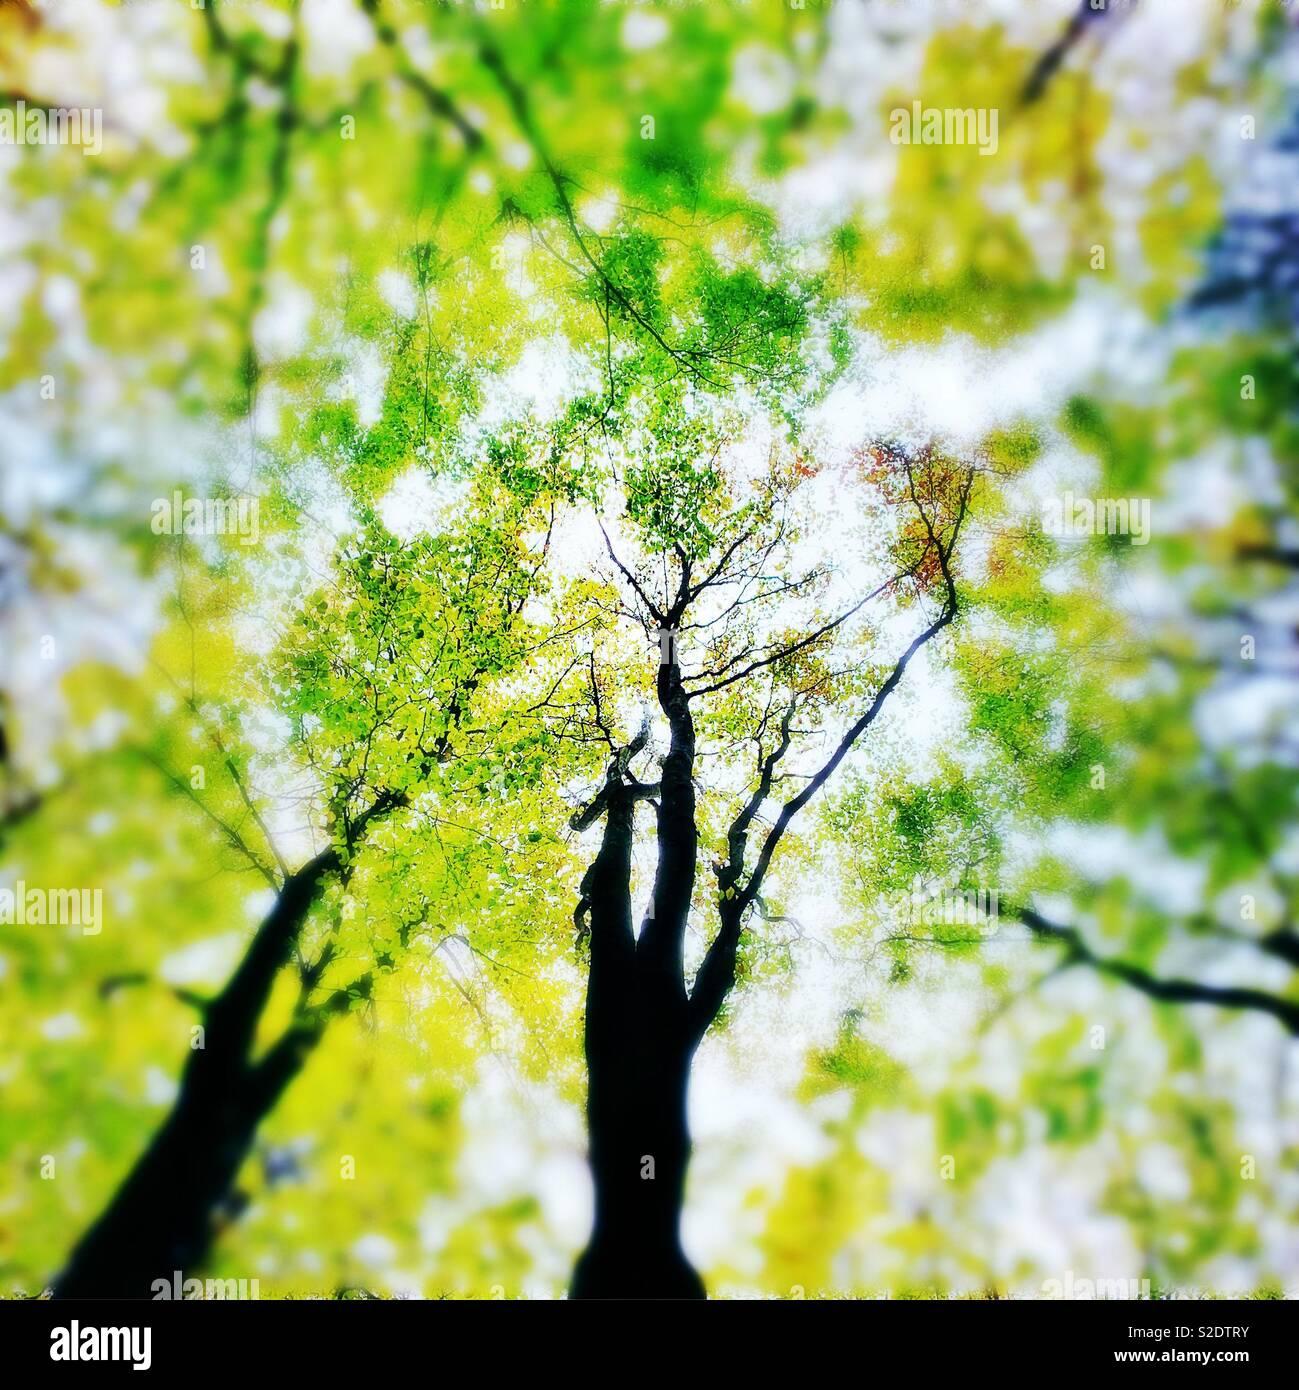 Looking up towards the tree canopy Stock Photo